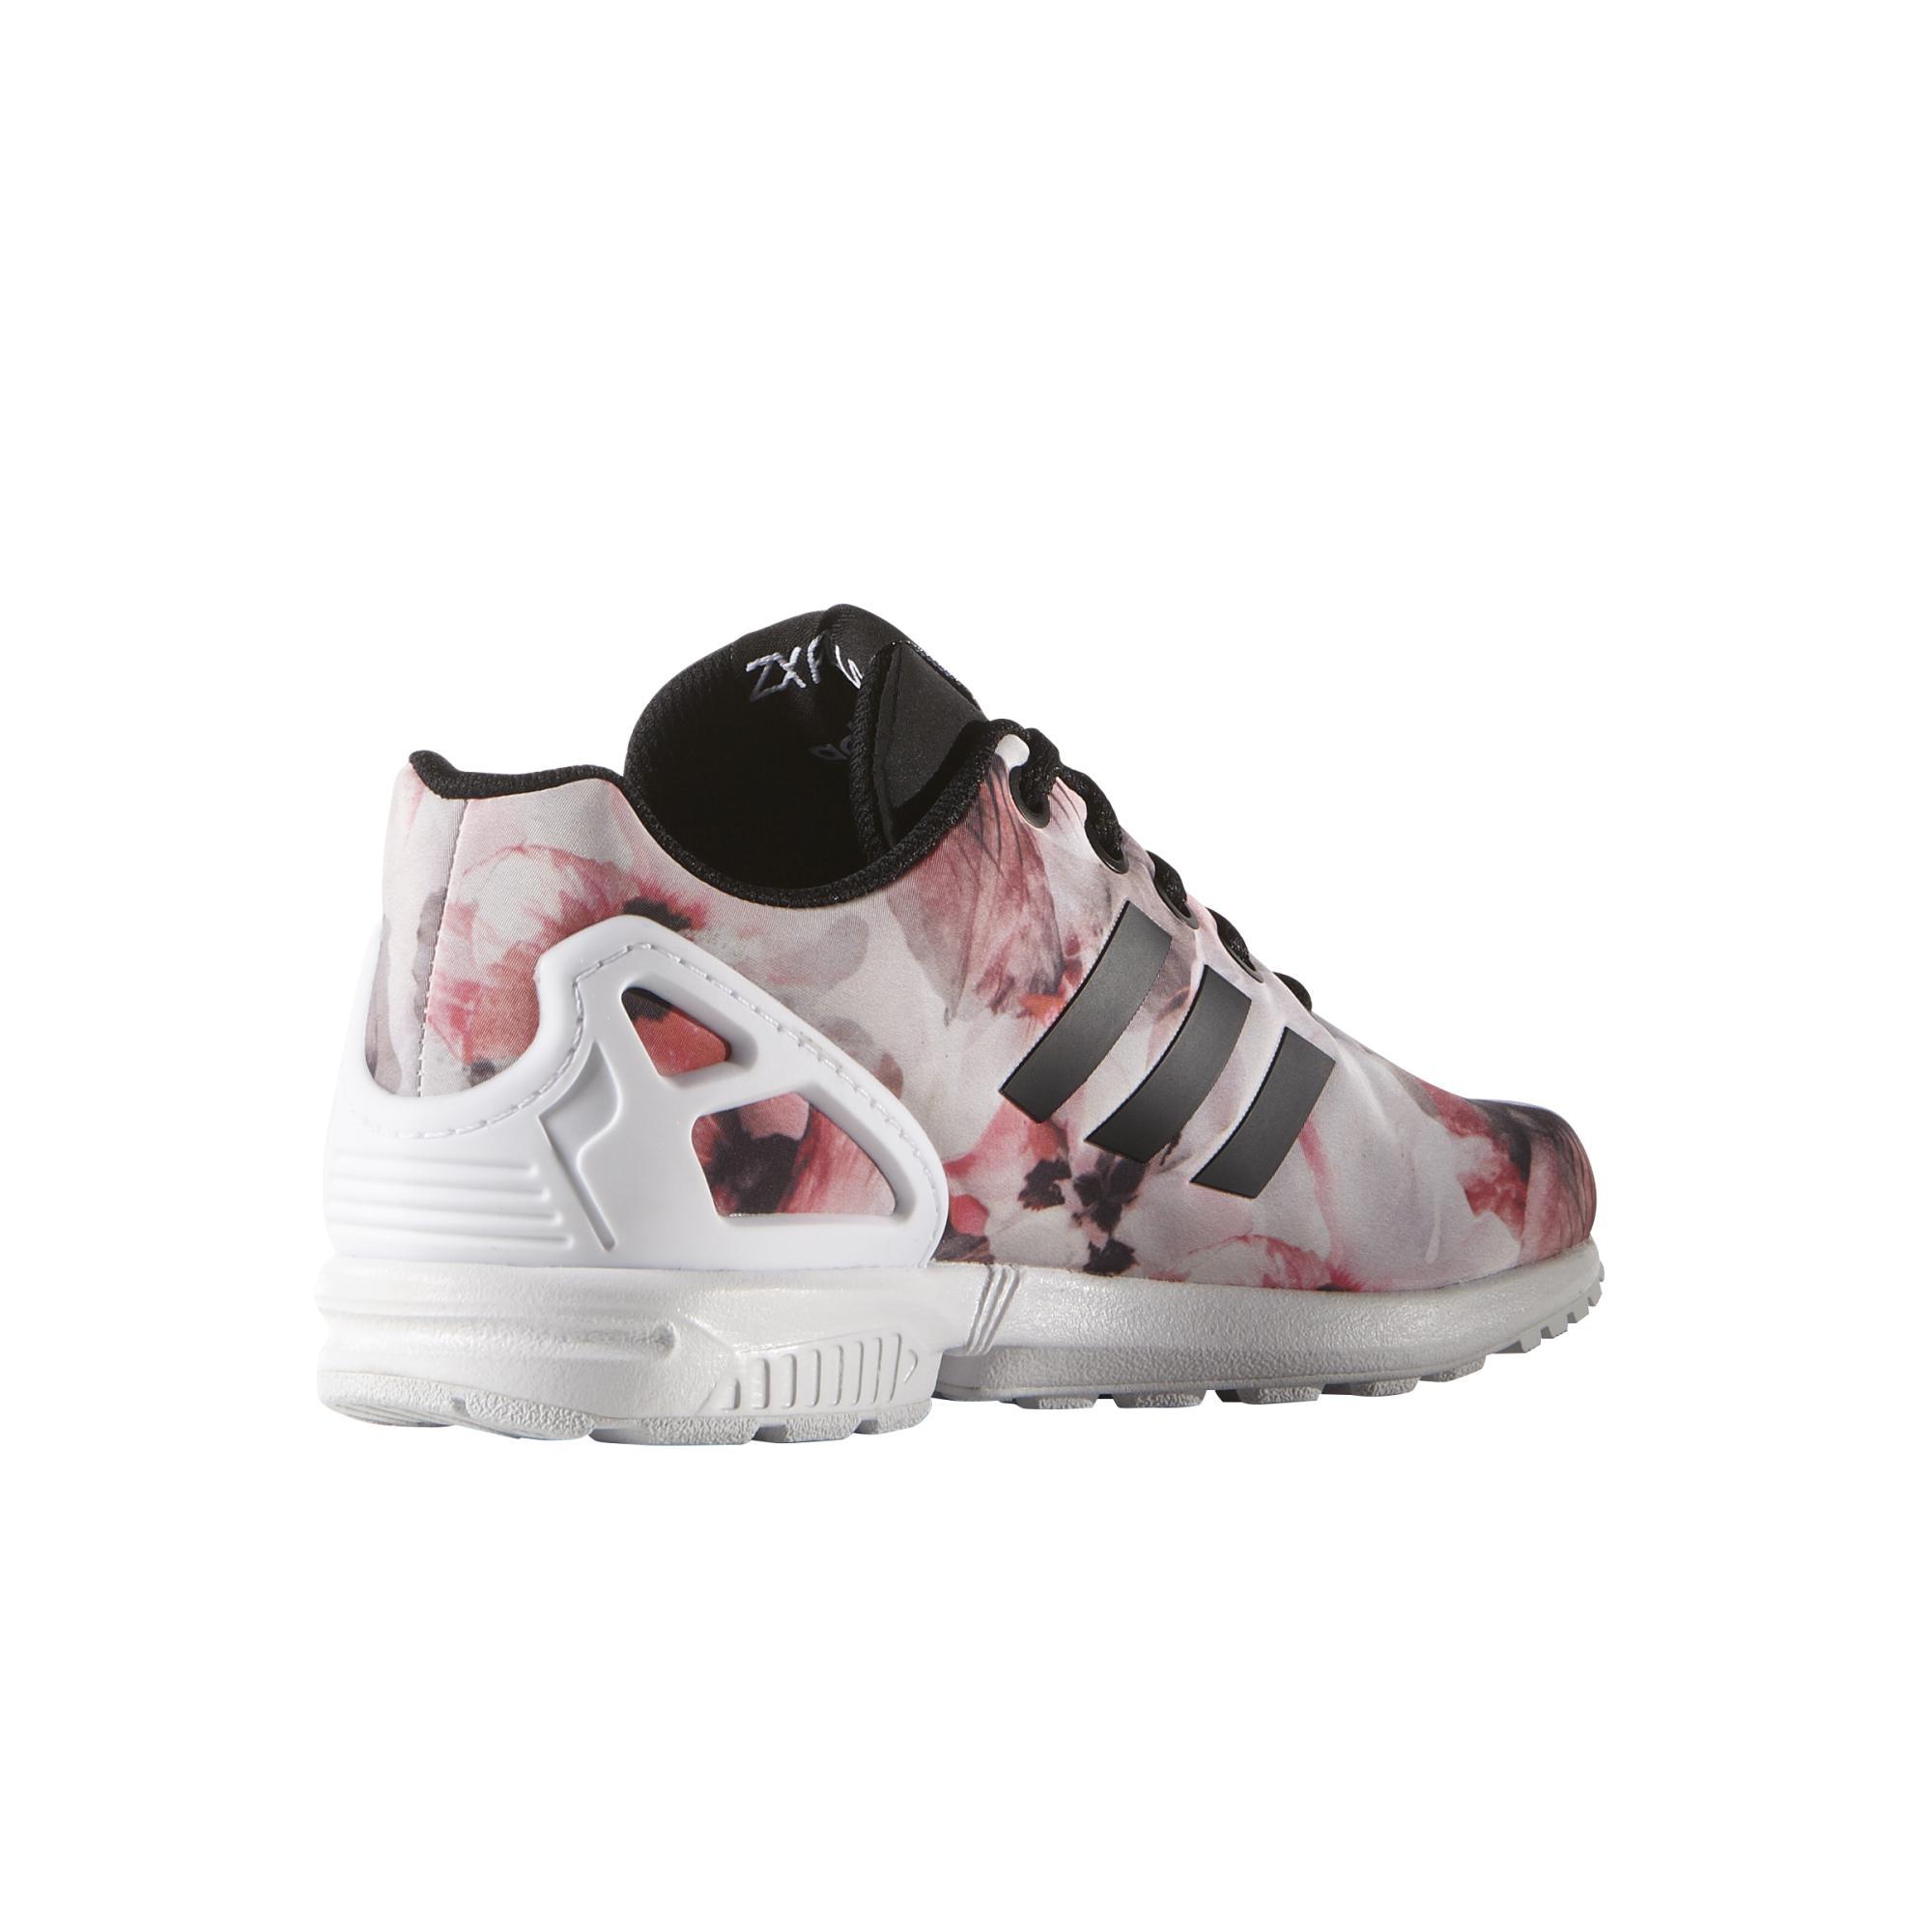 65905cec108 ... where to buy adidas originals zx flux k flowers rosa blanco negro 69870  df450